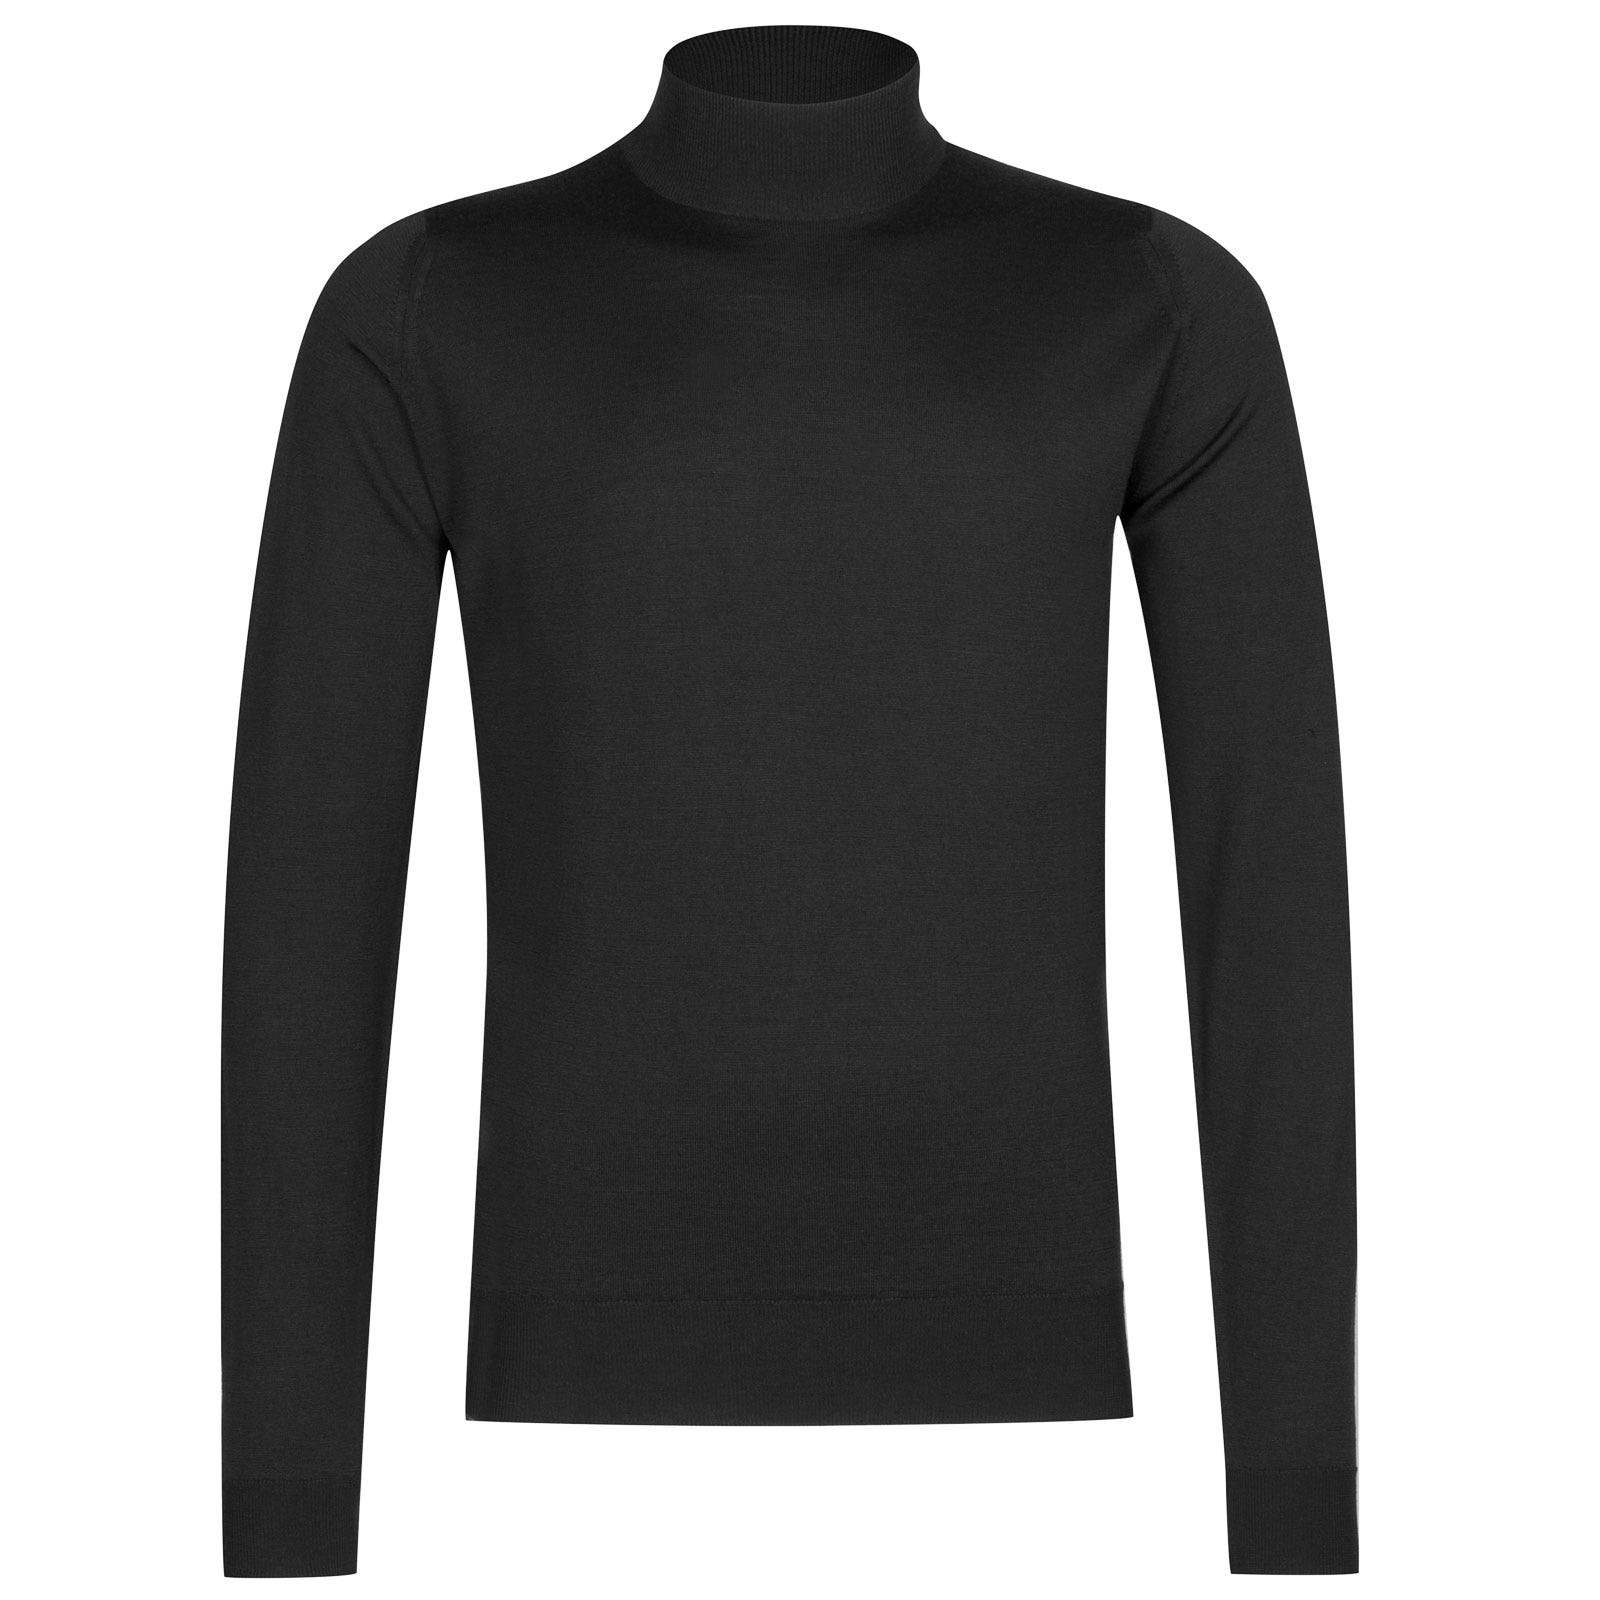 John Smedley harcourt Merino Wool Pullover in Black-XL